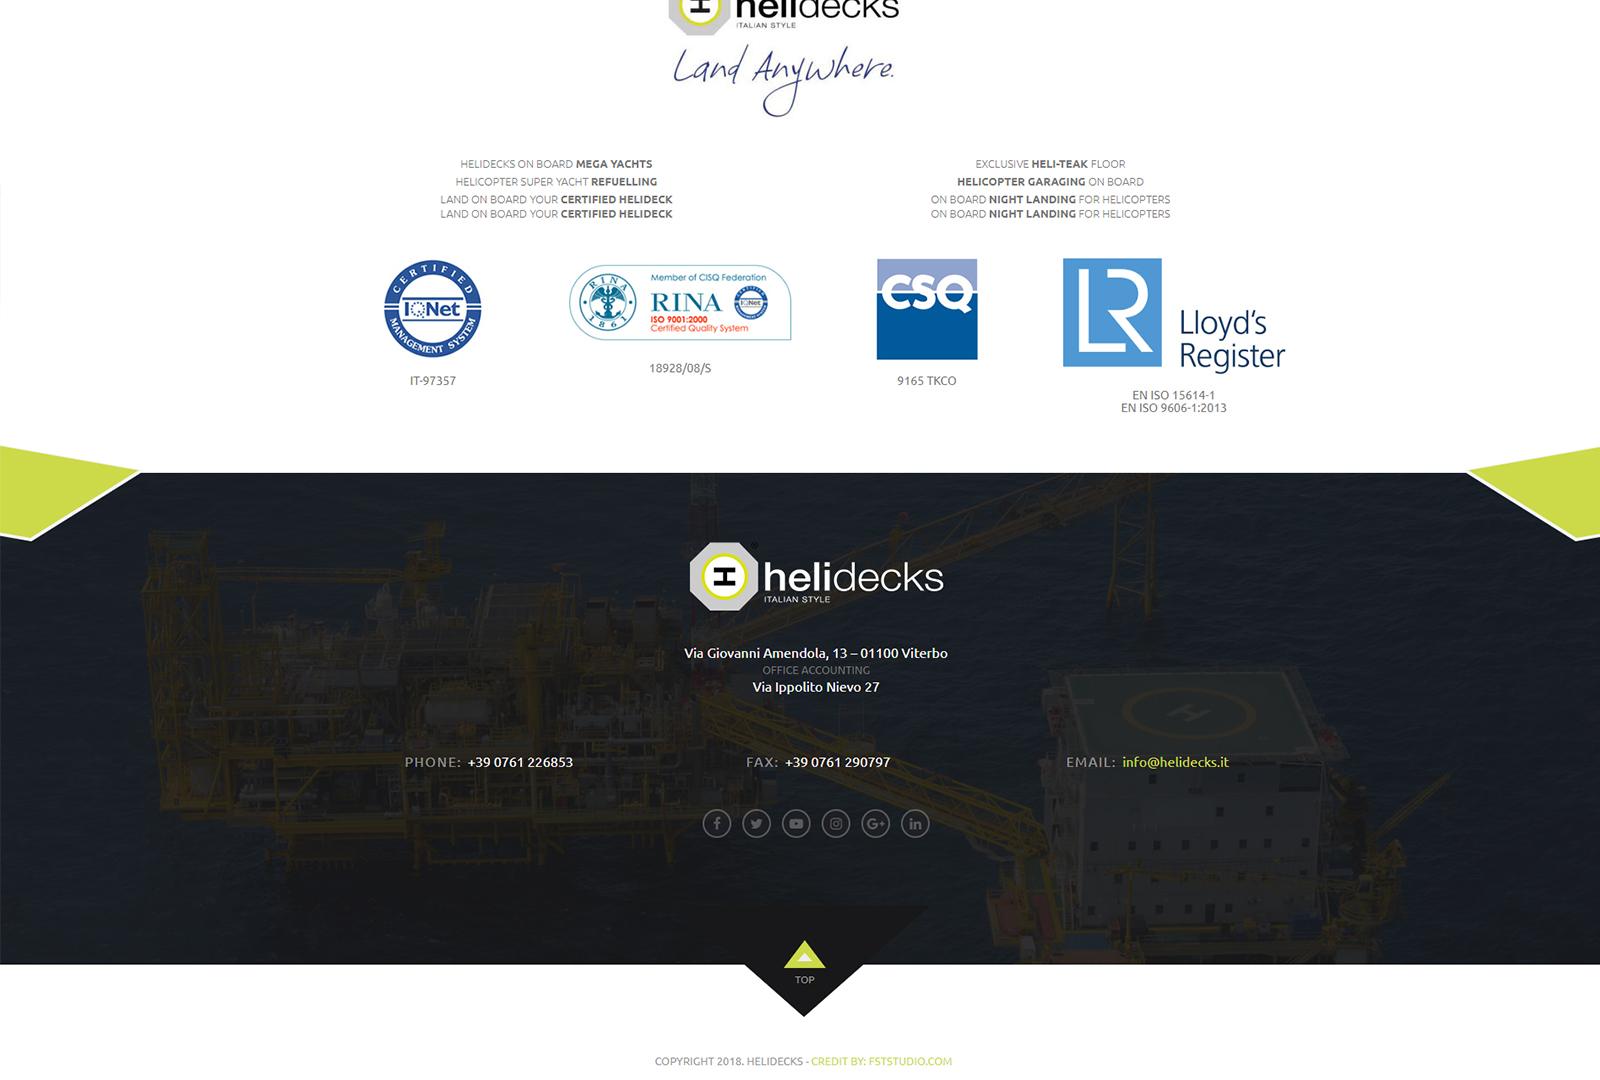 helidecks2